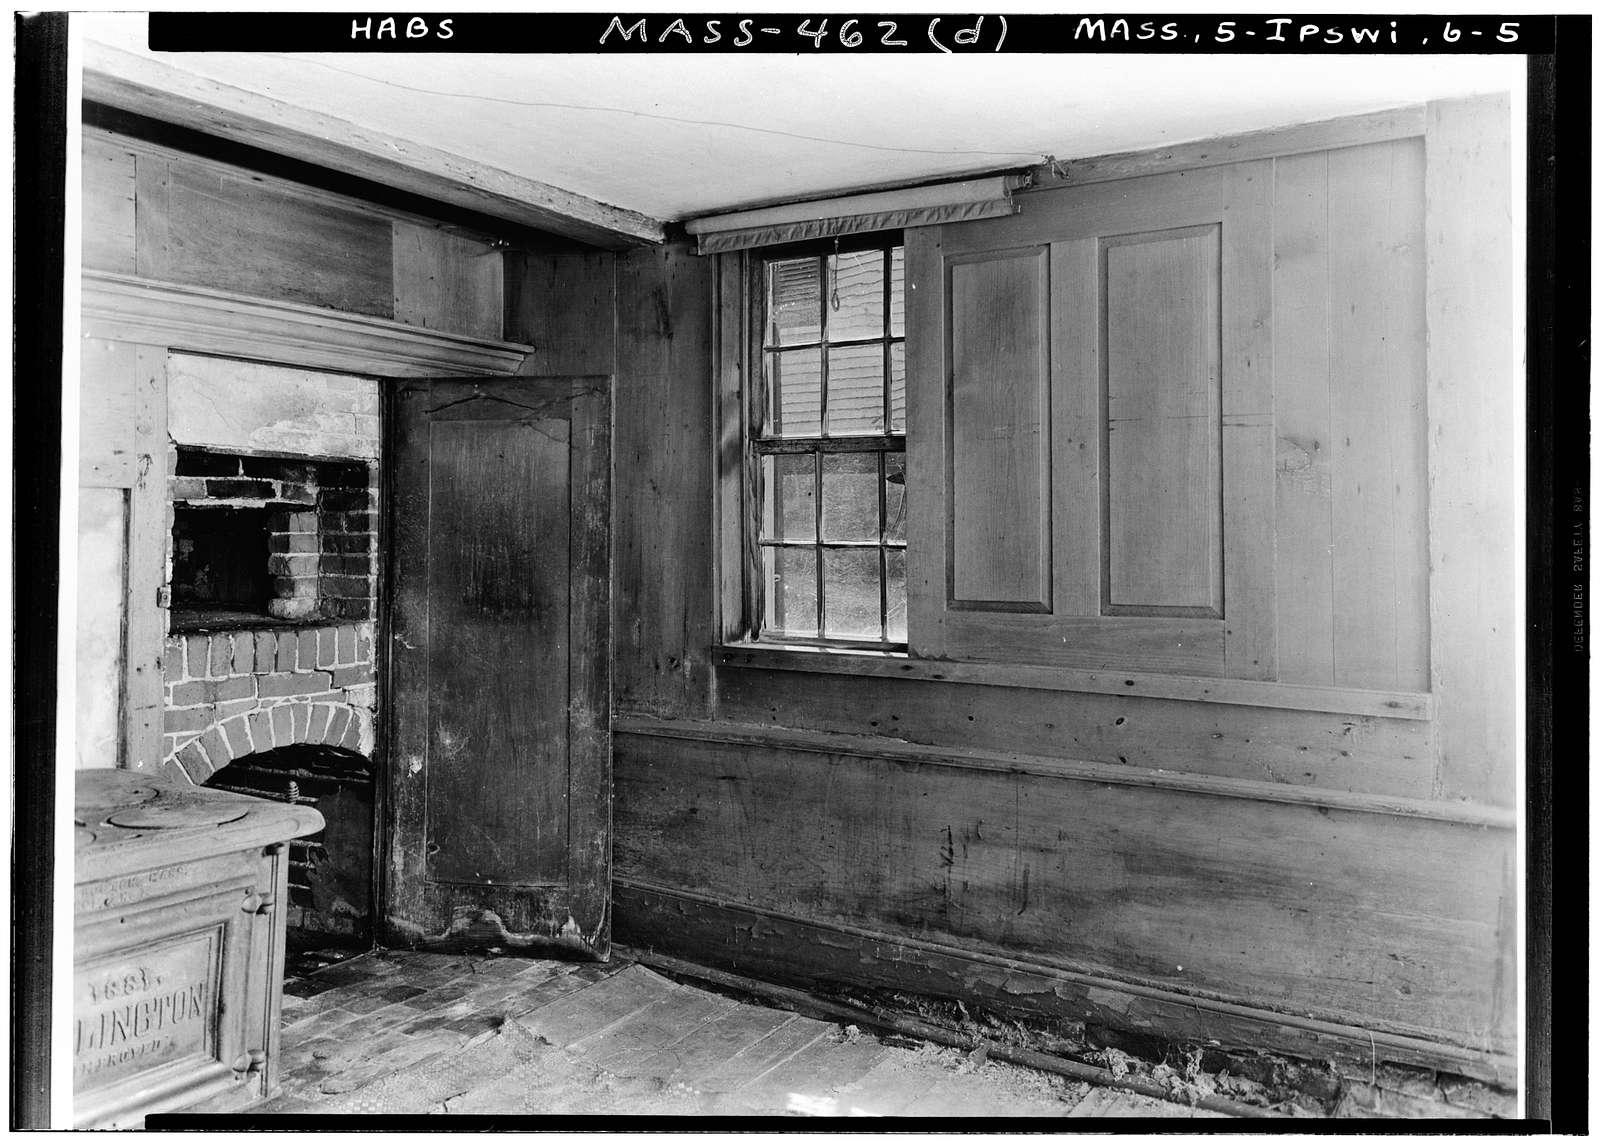 Waldo Caldwell House (Interiors), High Street, Ipswich, Essex County, MA